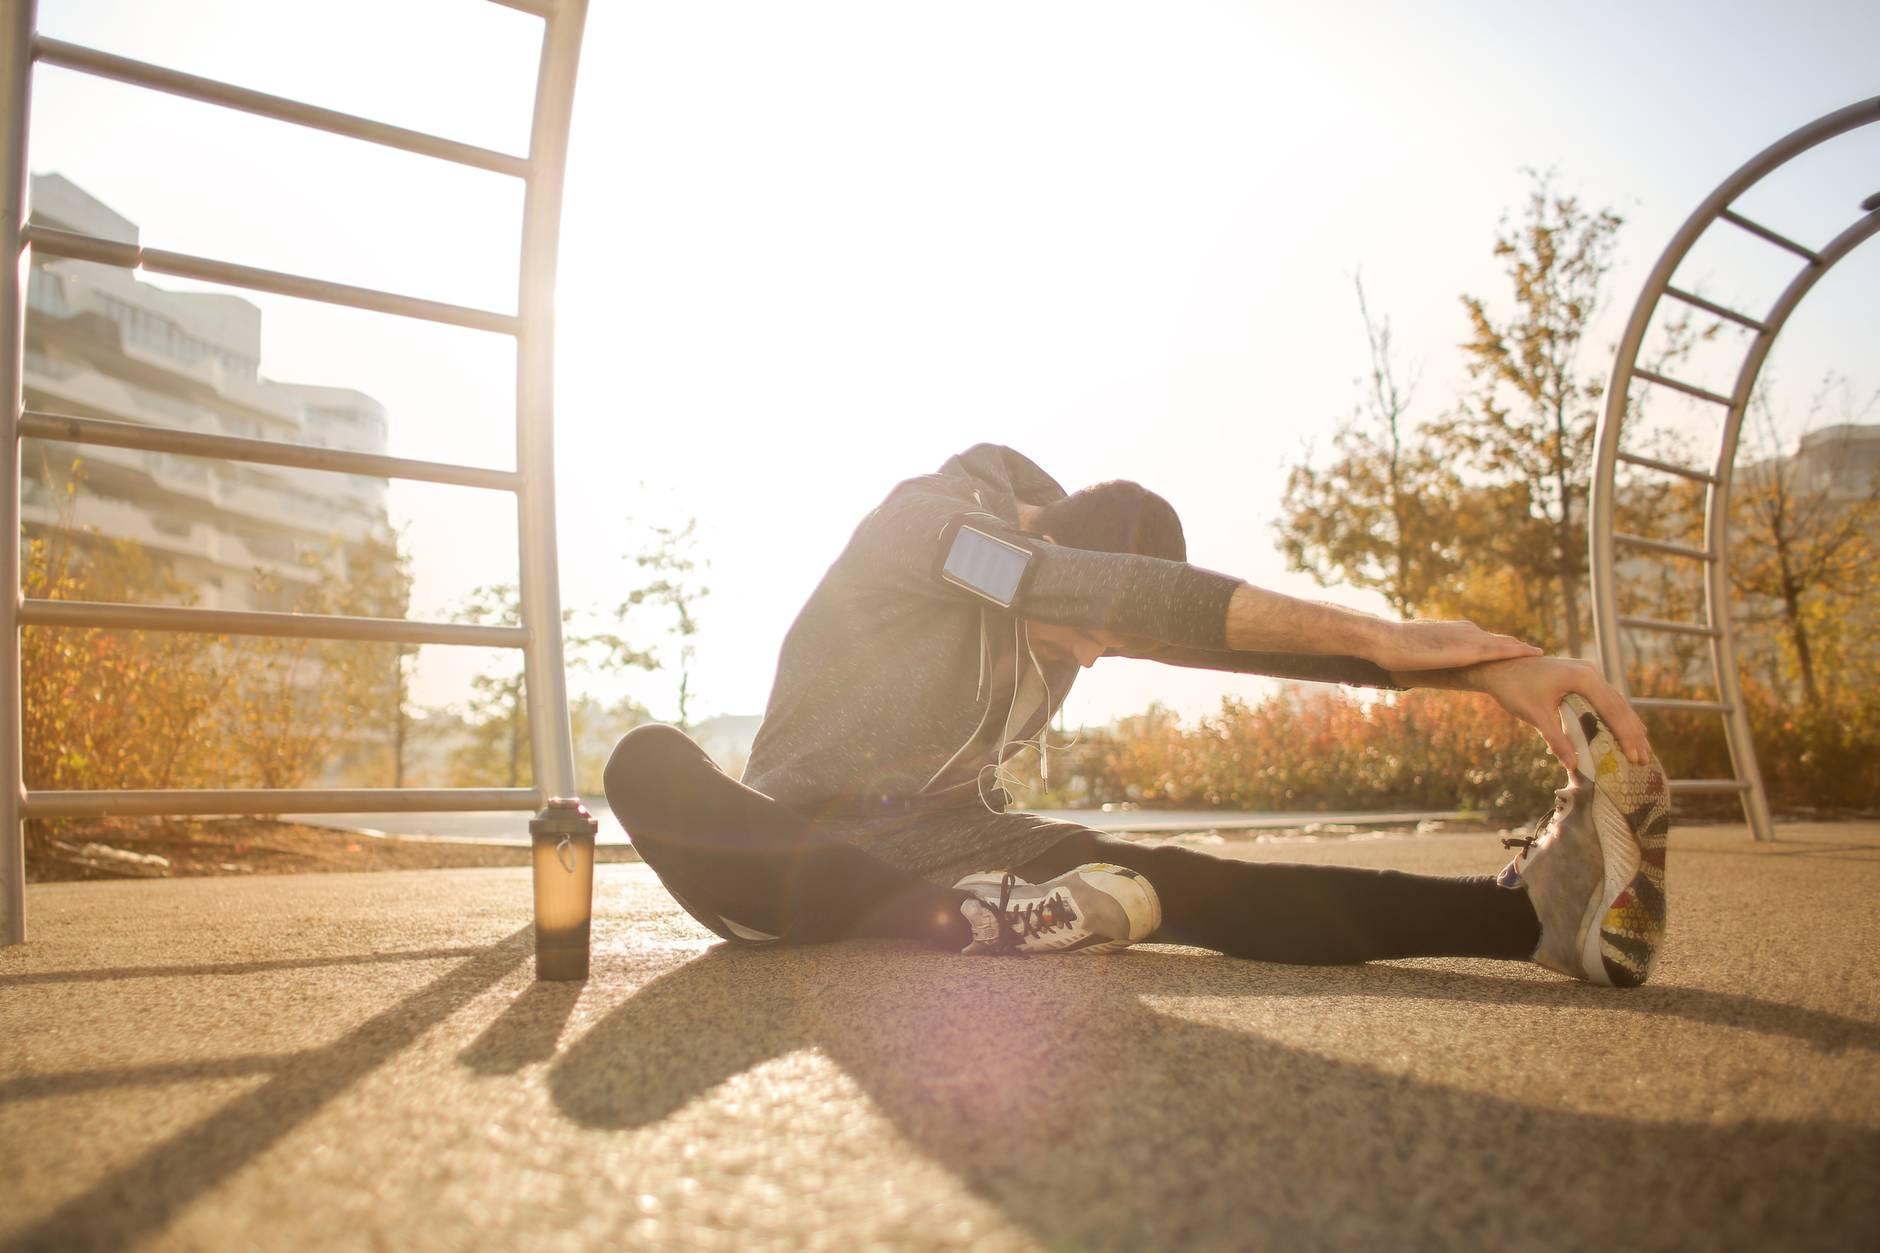 flexible sportsman stretching on sports ground